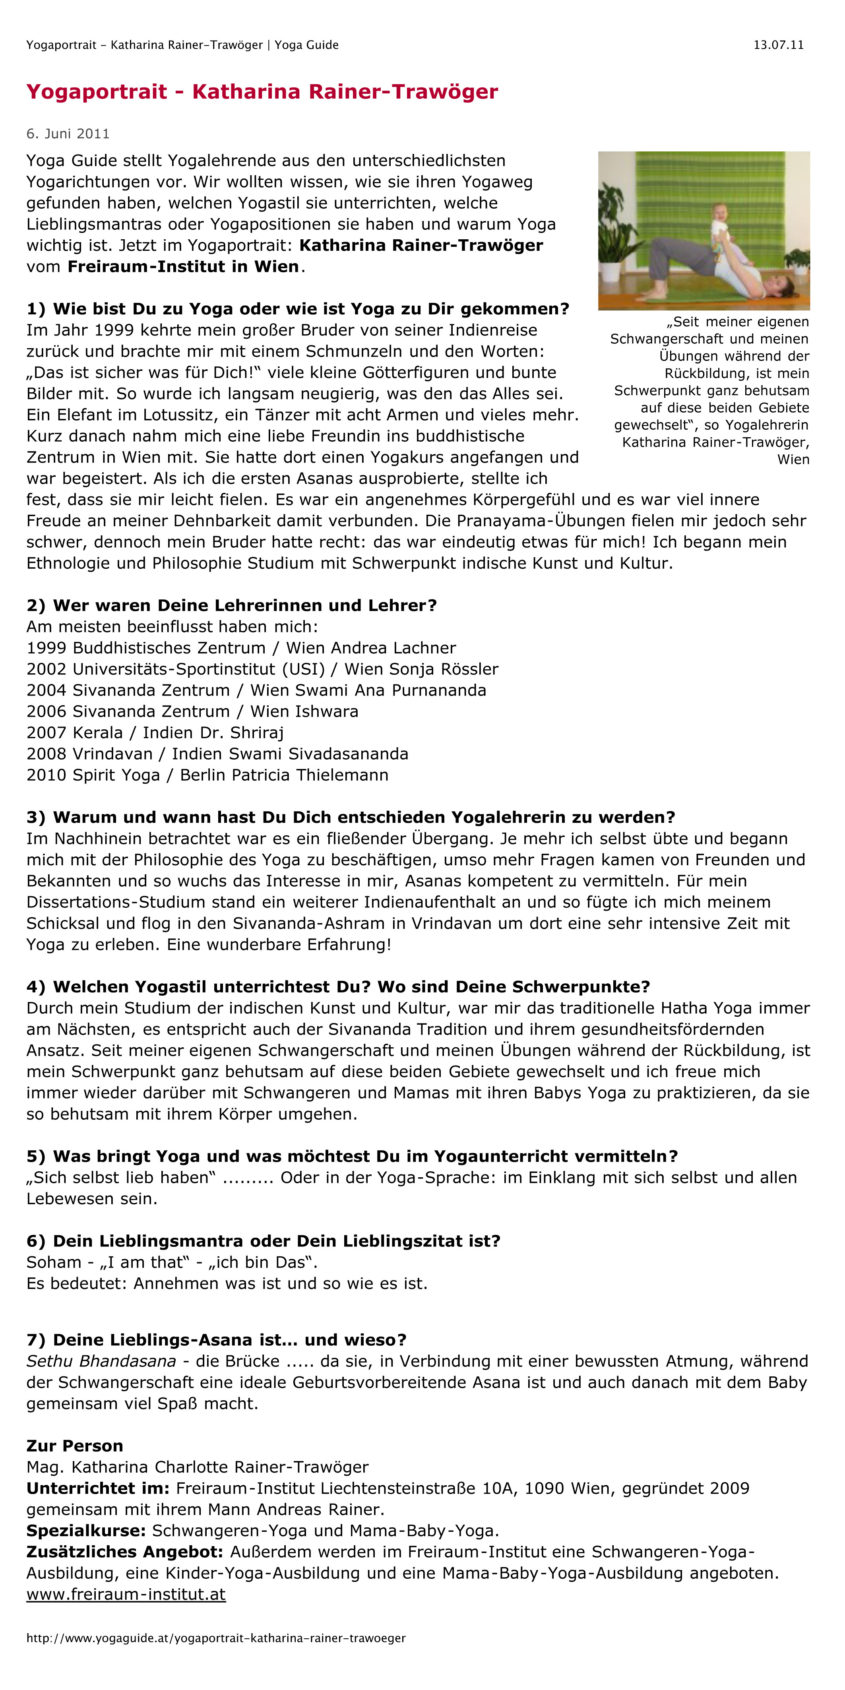 Yogaportrait - Katharina Rainer-Trawöger   Yoga Guide